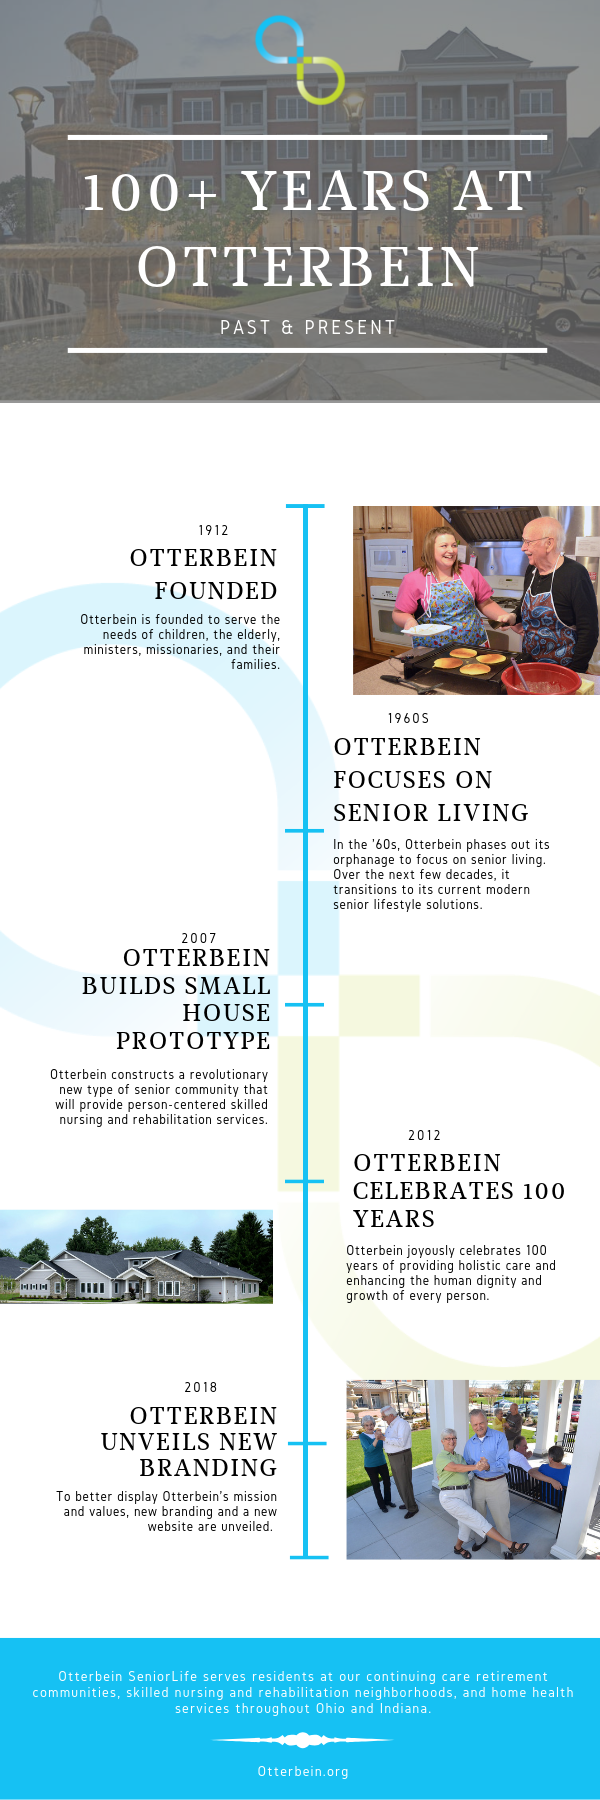 Otterbein-100-Years-Infographic